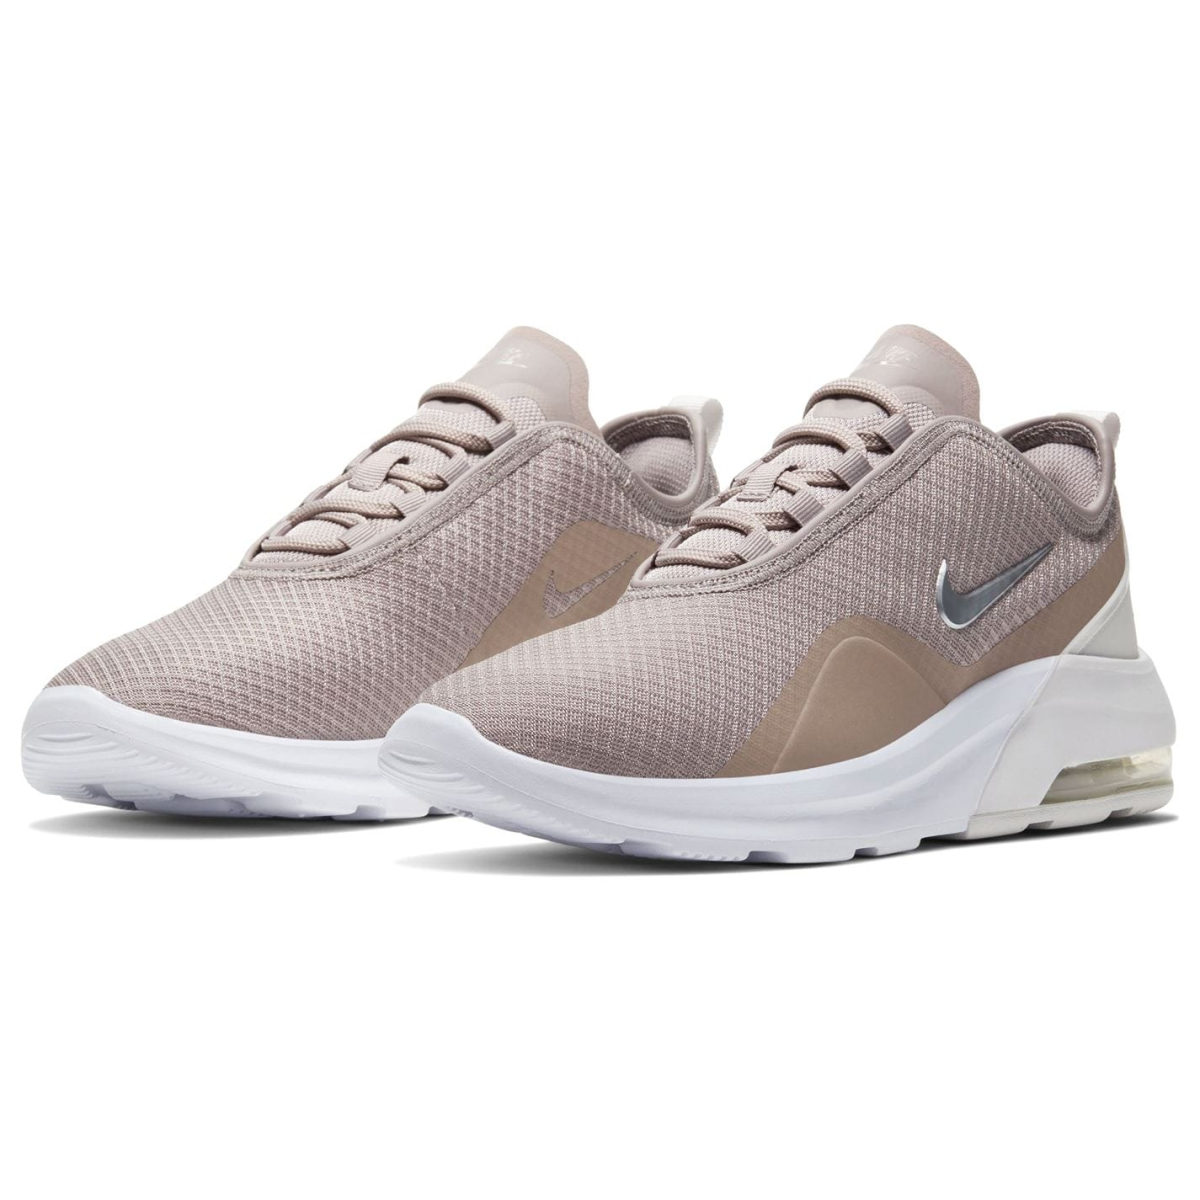 Nike-Air-Max-Motion-2-Turnschuhe-Damen-Sneaker-Sportschuhe-Laufschuhe-4024 Indexbild 5